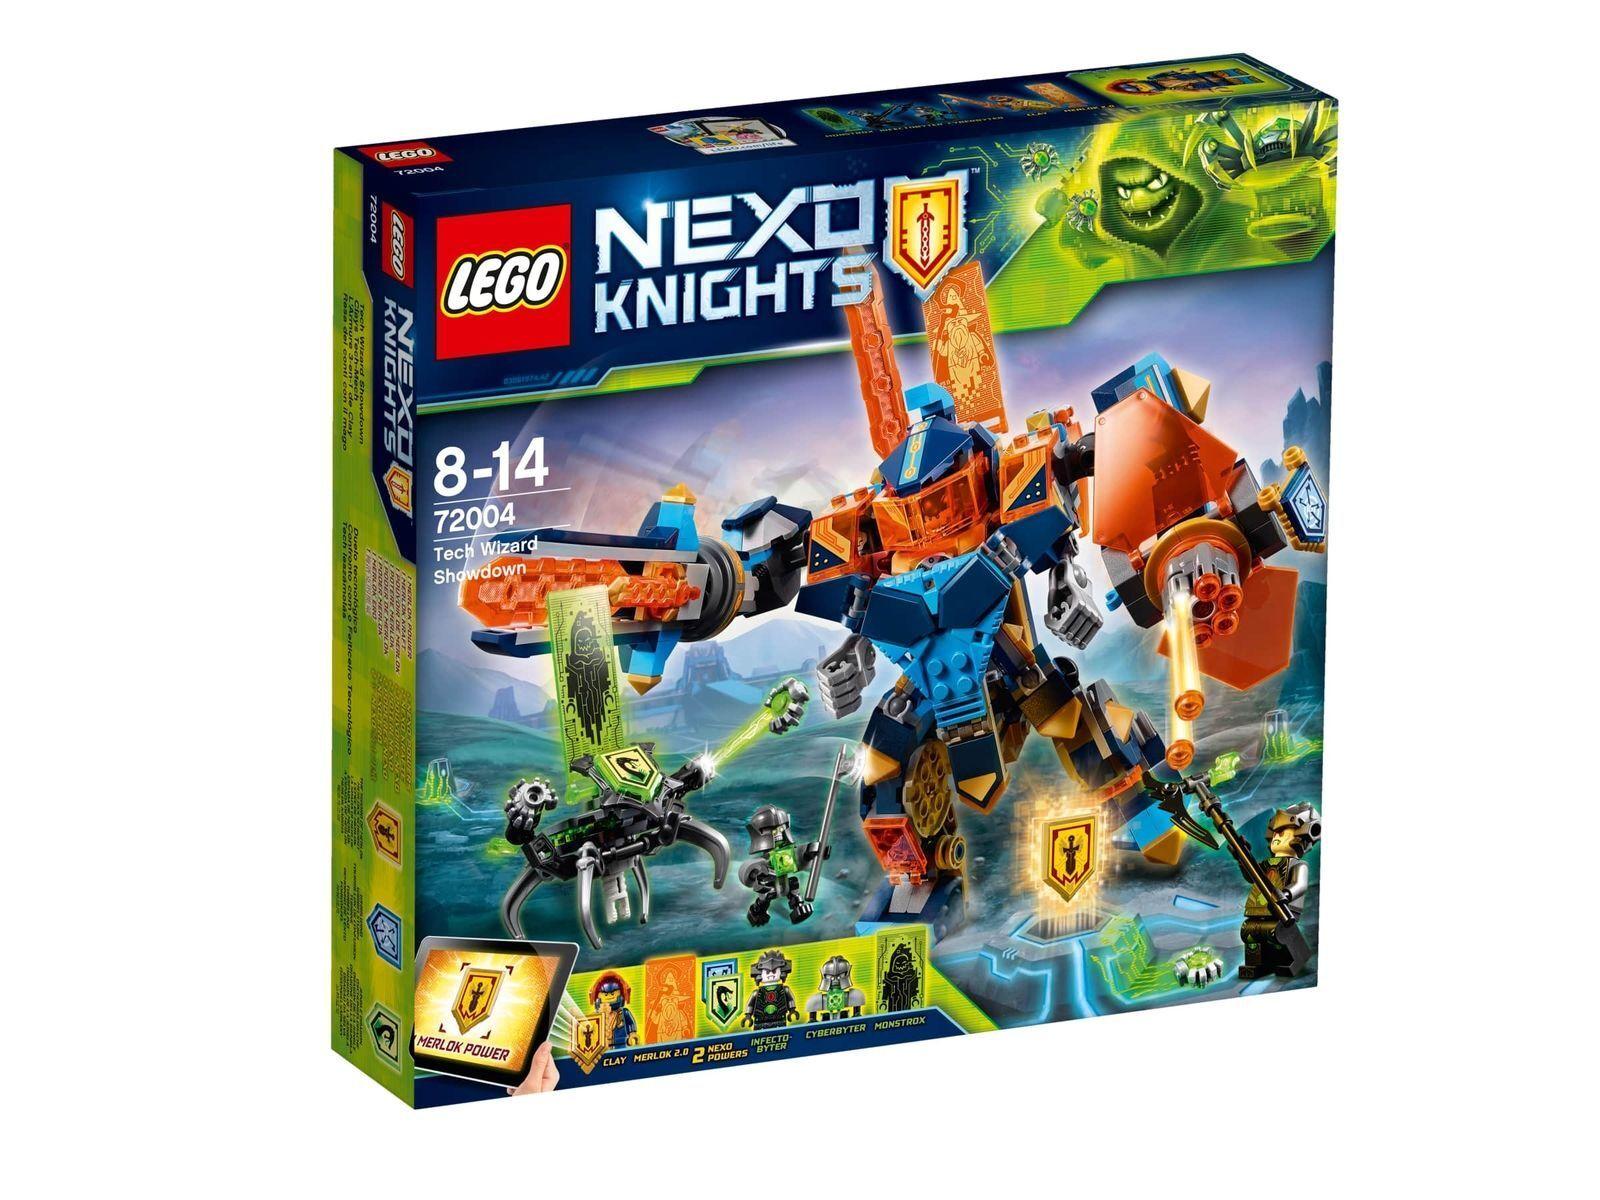 LEGO NEXO KNIGHTS Clays Tech-Mech 72004 NEU OVP OVP OVP 6486ff